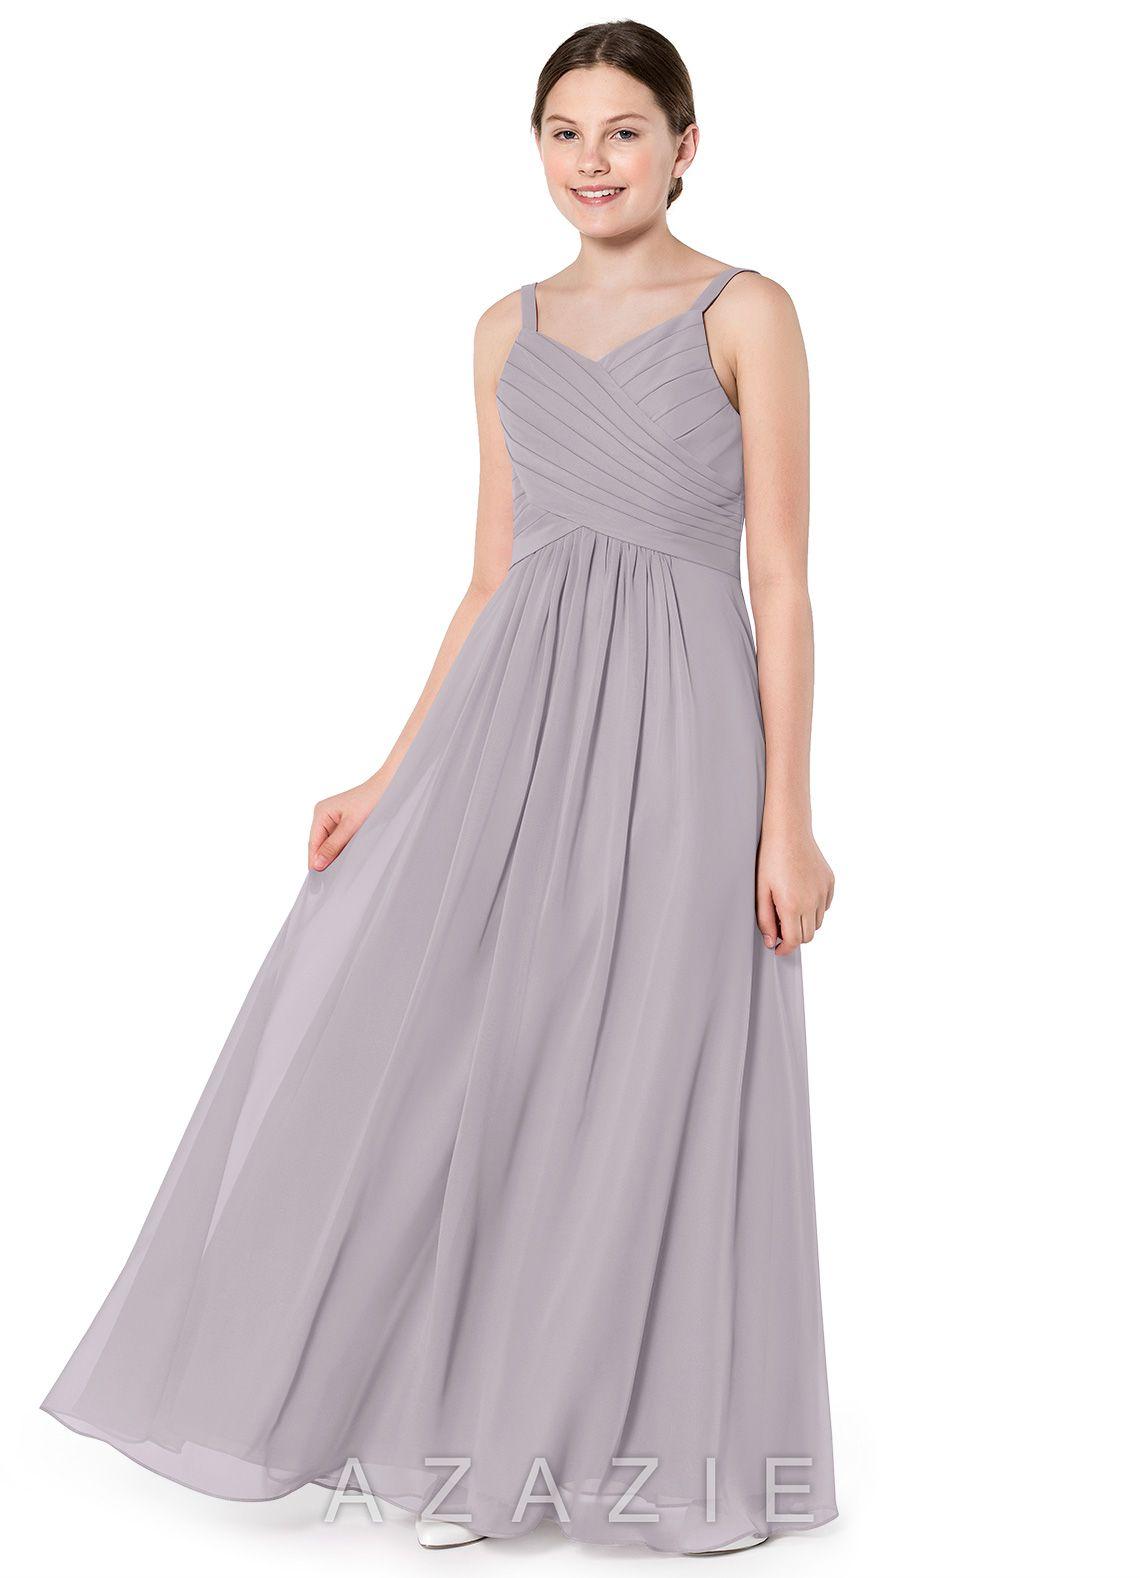 cb7b32f1f Azazie Haleigh JBD Junior Bridesmaid Dress | Azazie